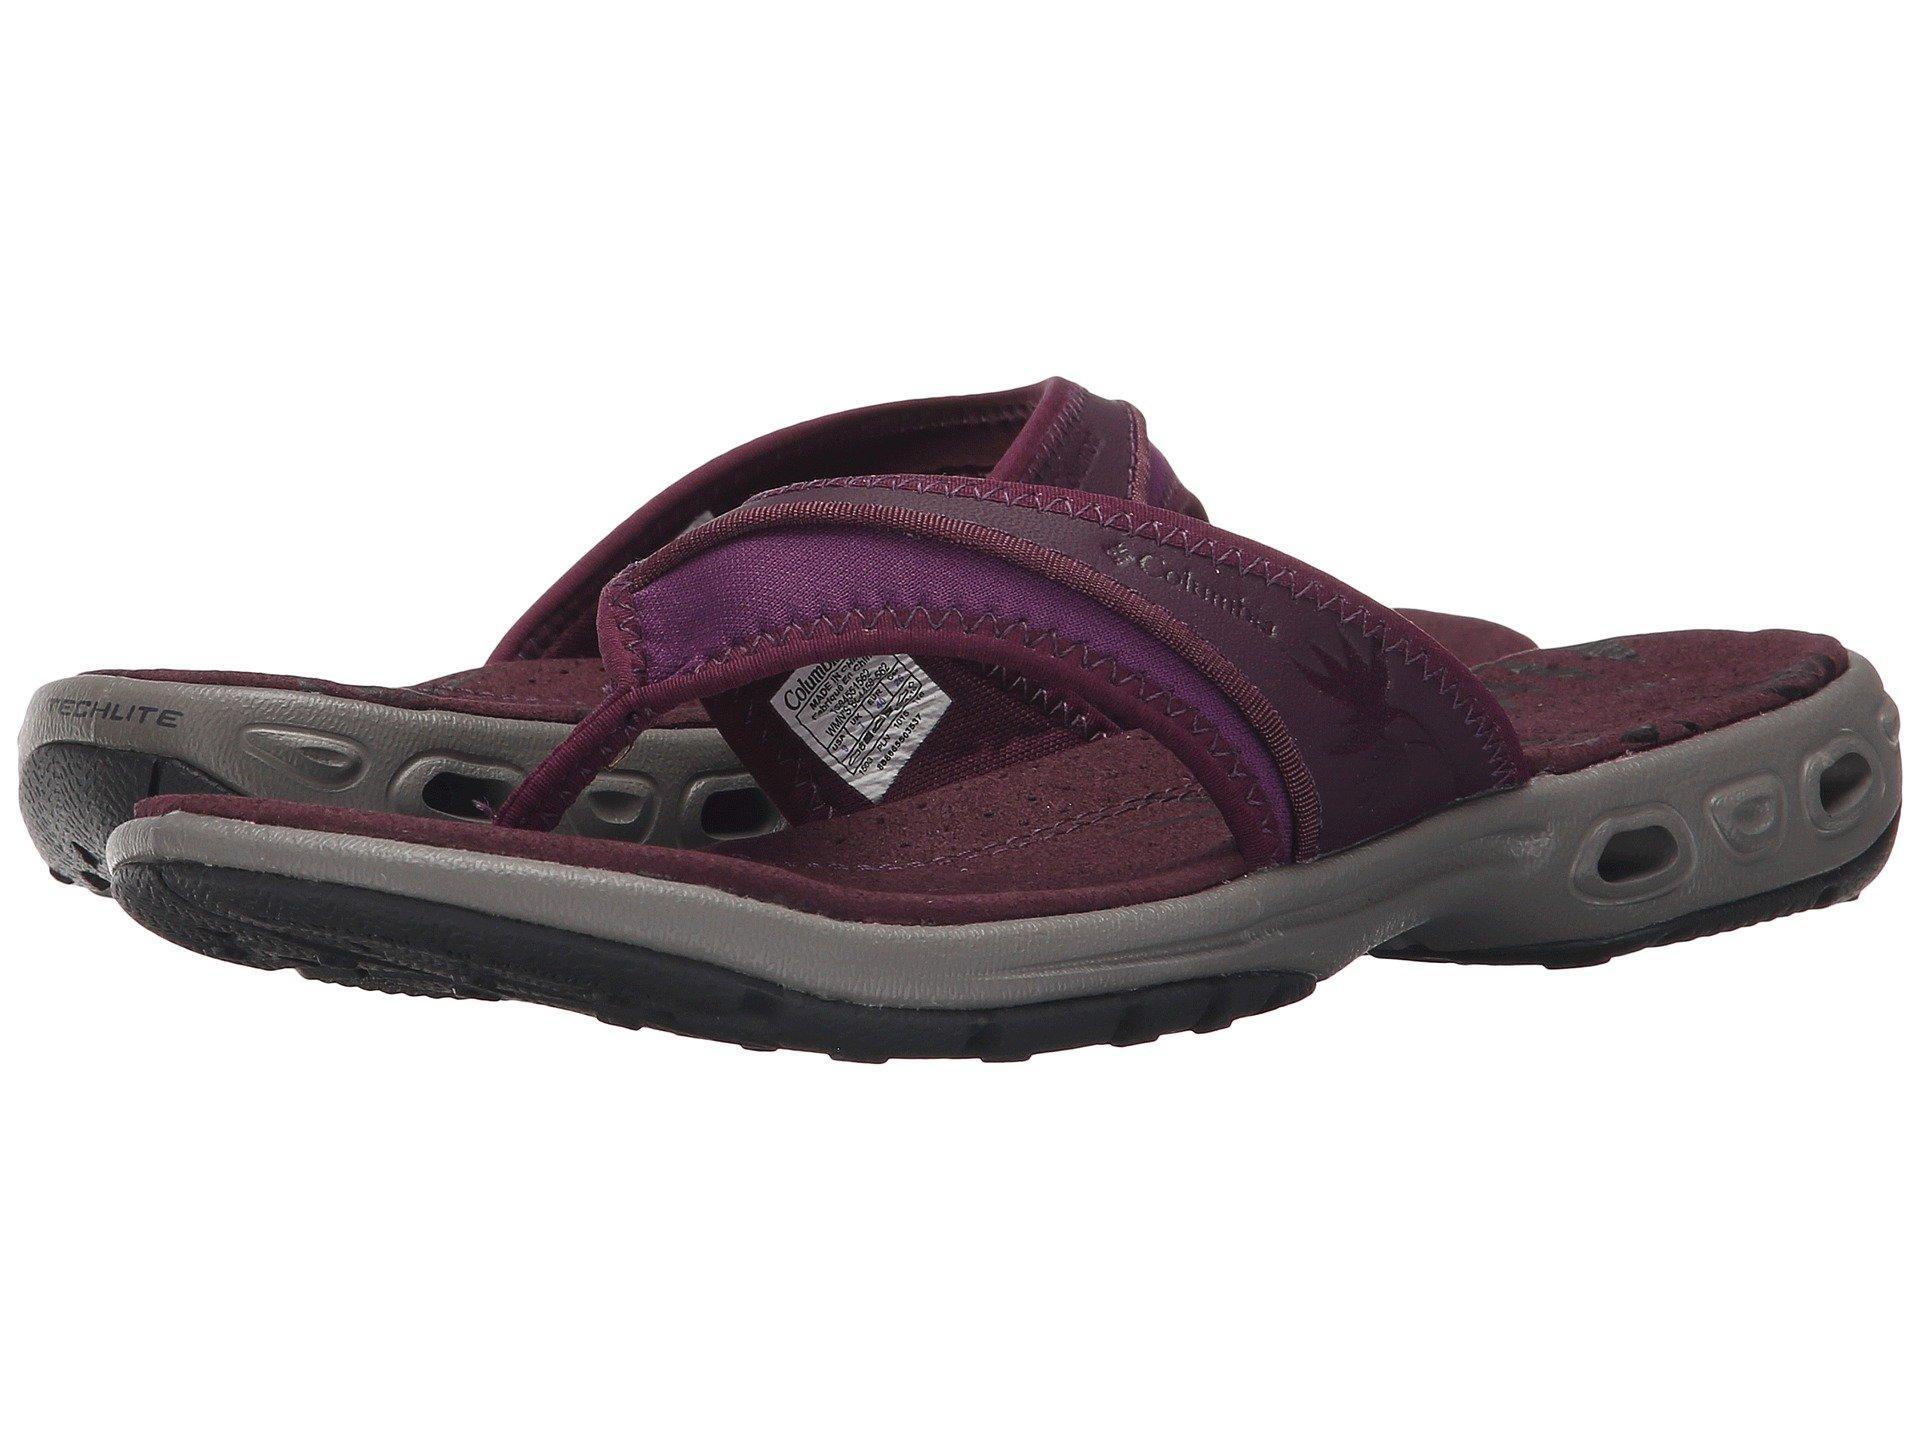 acc8e34861f Columbia Kambi™ Vent In Purple Dahlia Glory